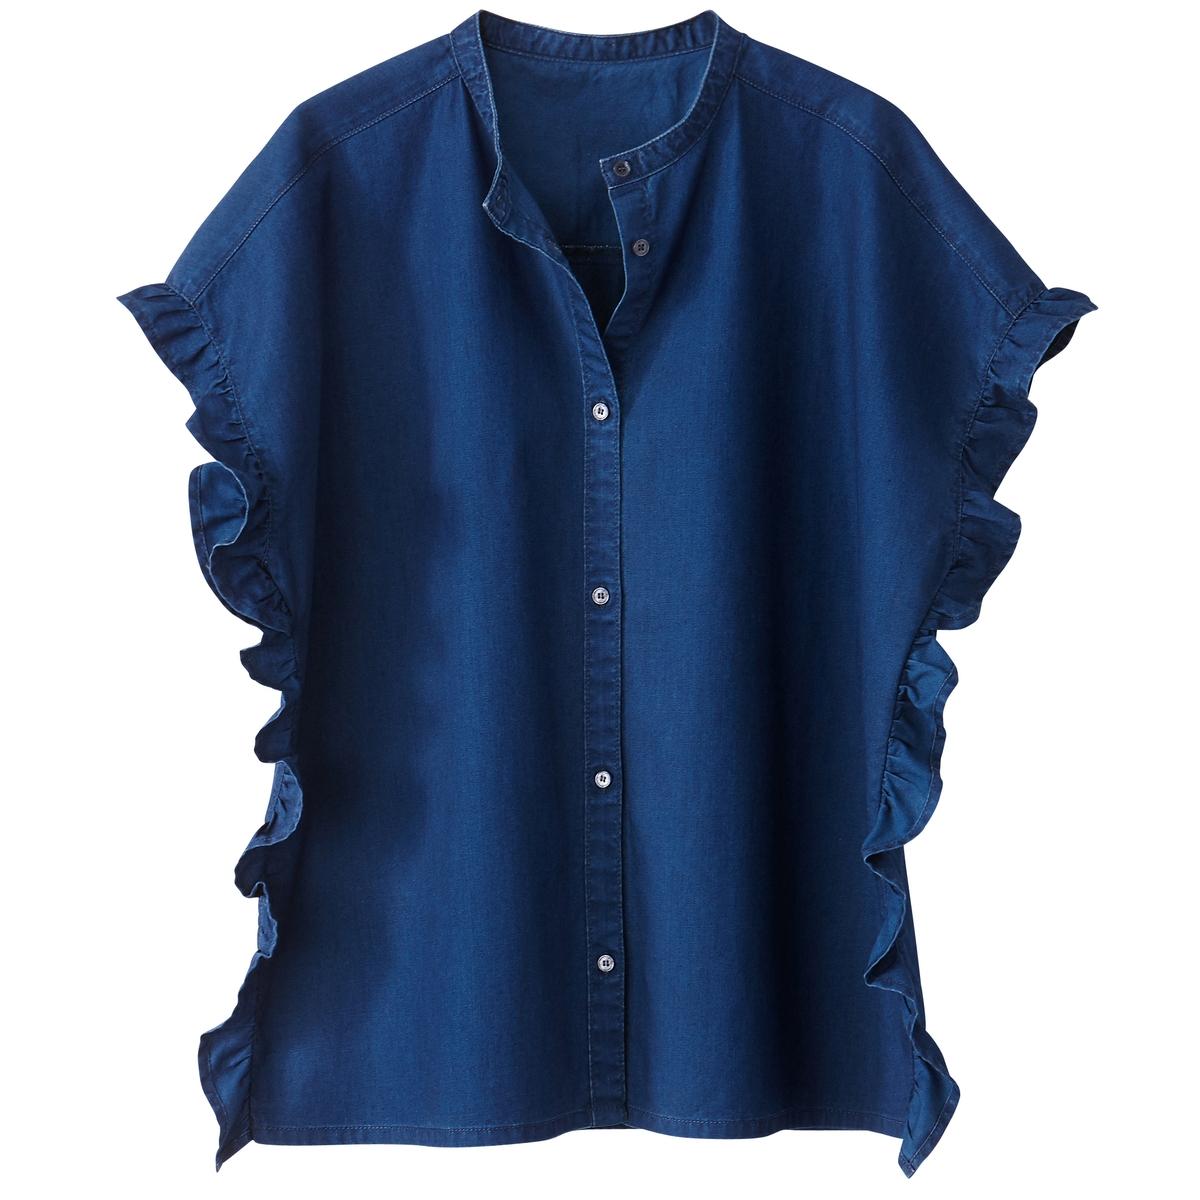 Рубашка с элементами денима, с воланами